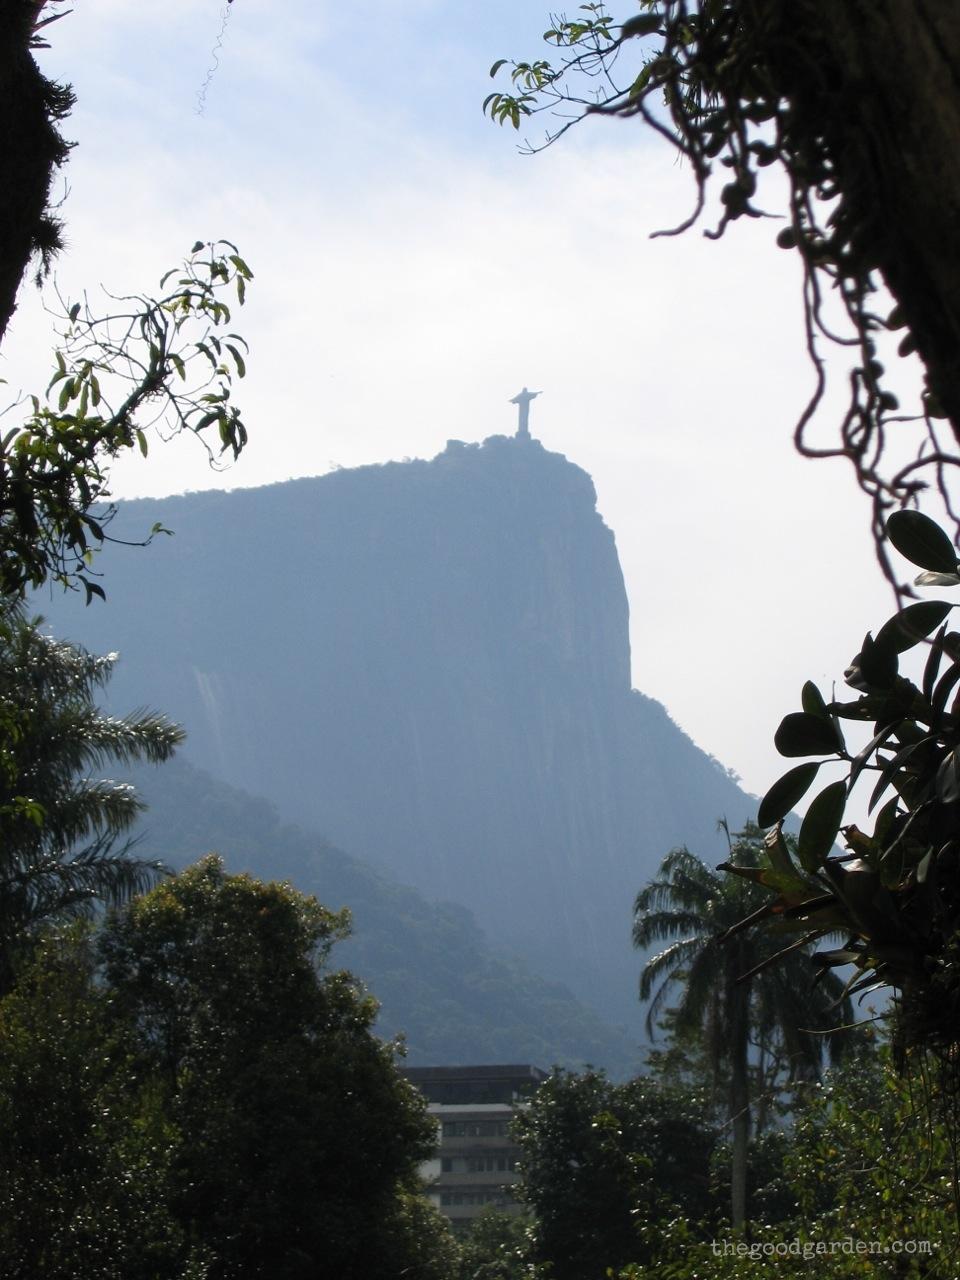 thegoodgarden|brazil|riodejaneiro|garden|927.jpg